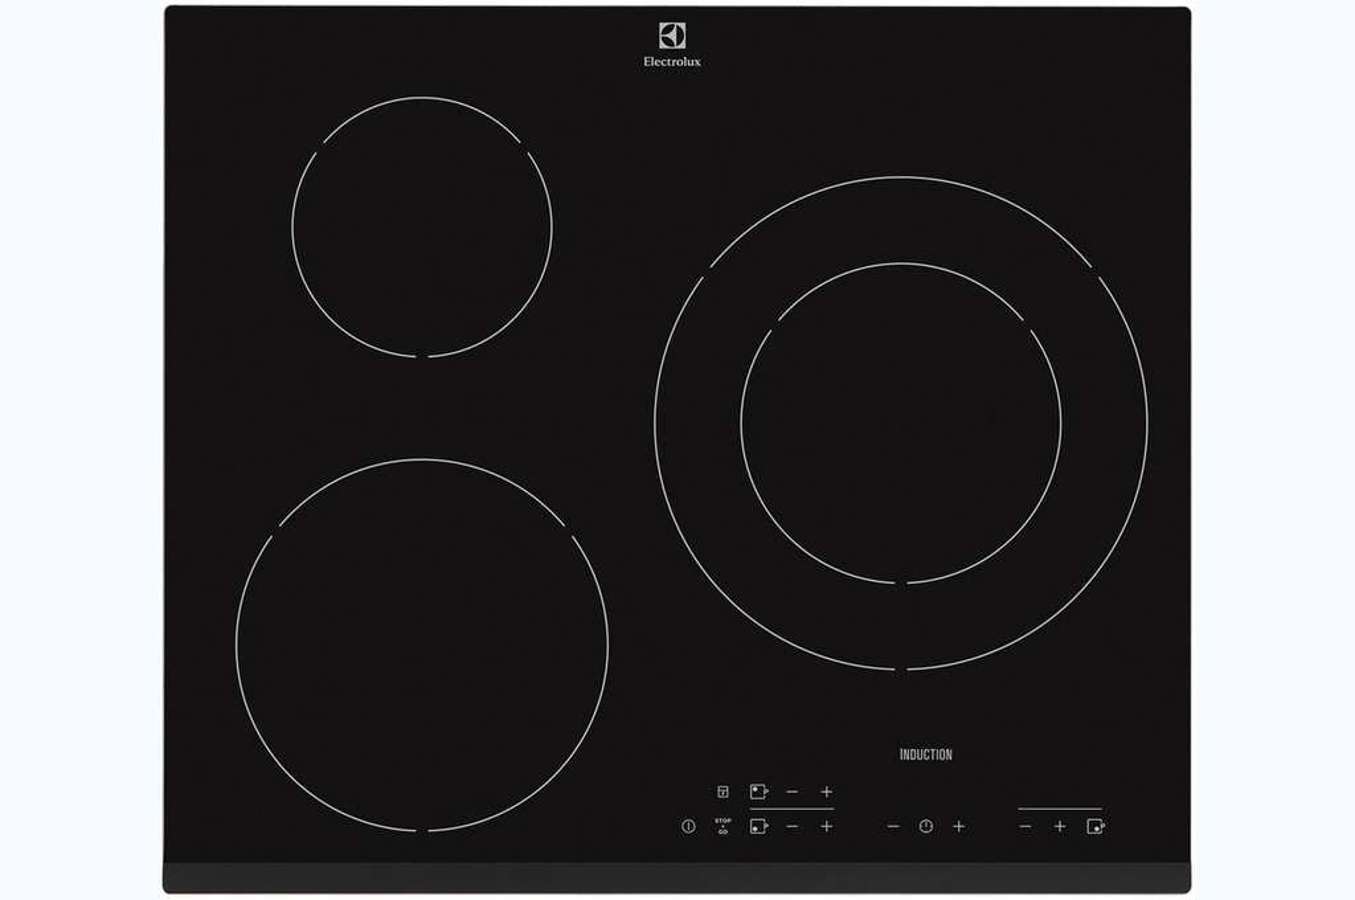 plaque induction electrolux e6223hfk noir 3 foyers. Black Bedroom Furniture Sets. Home Design Ideas